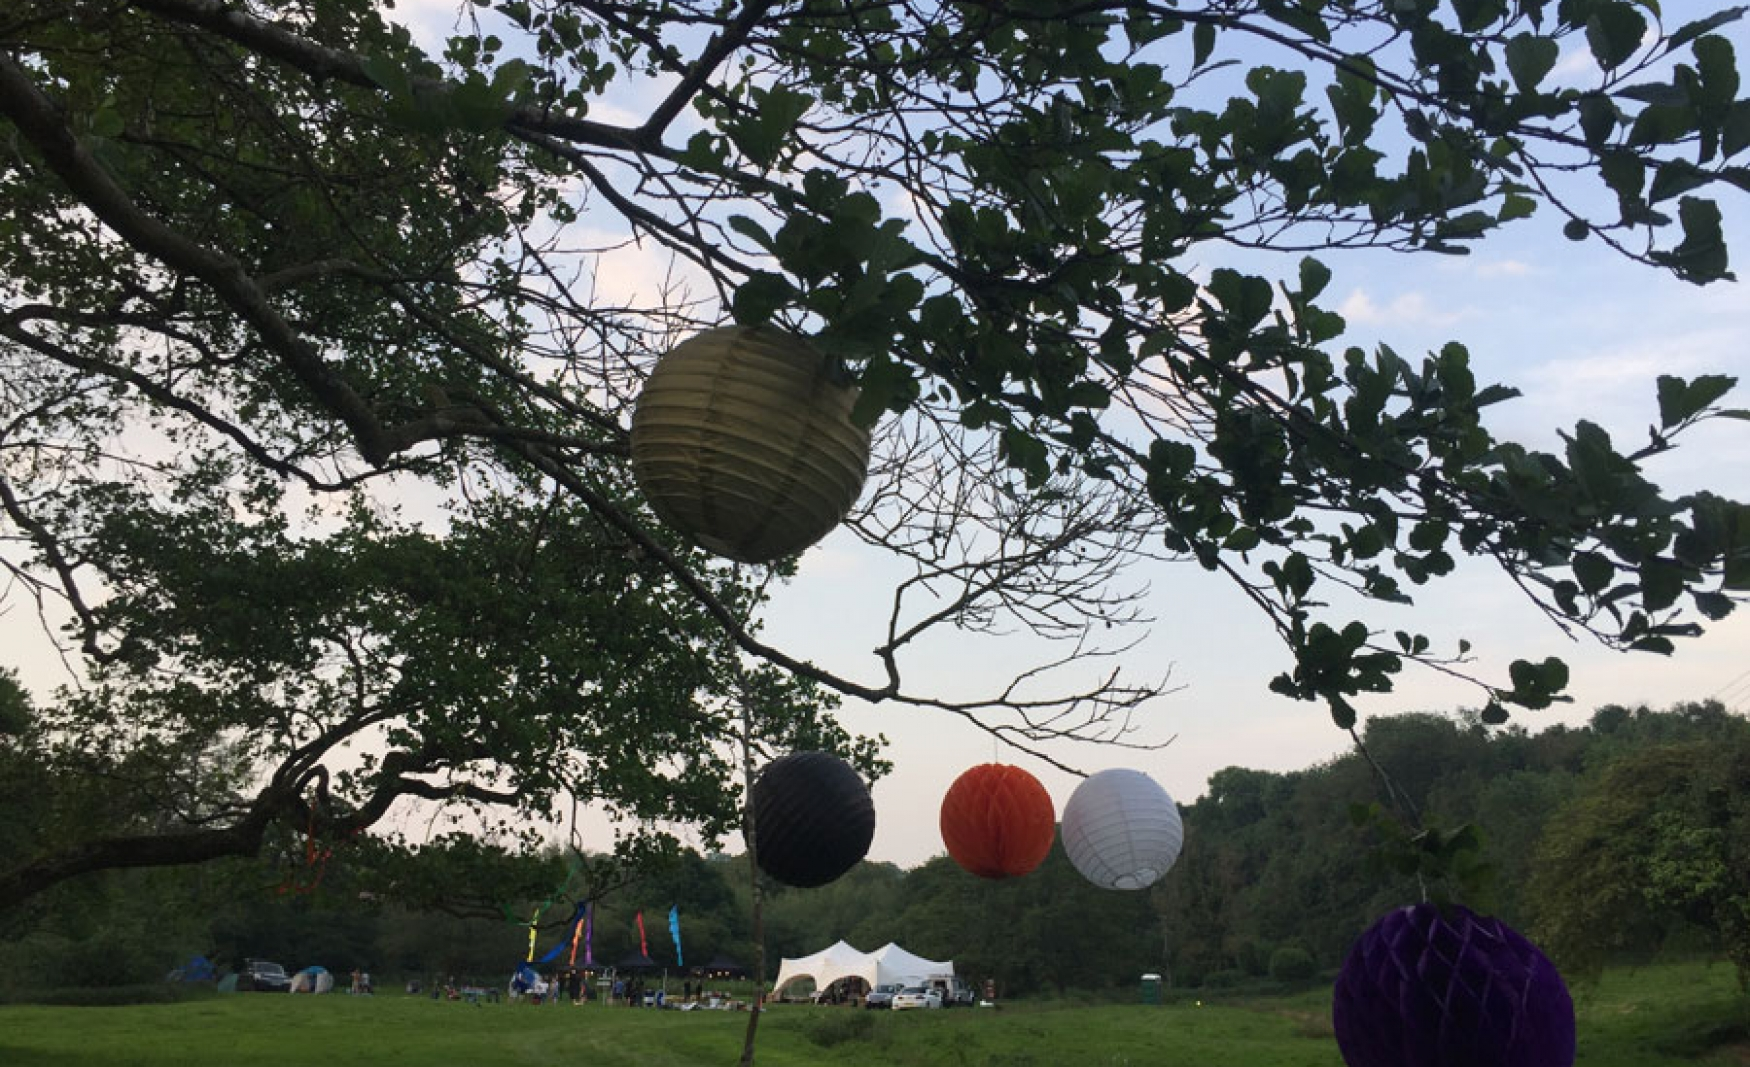 fiesta-fields-outdoor-wedding-events-company-tipi-surrey-sussex-eashing-farm-godalming-3